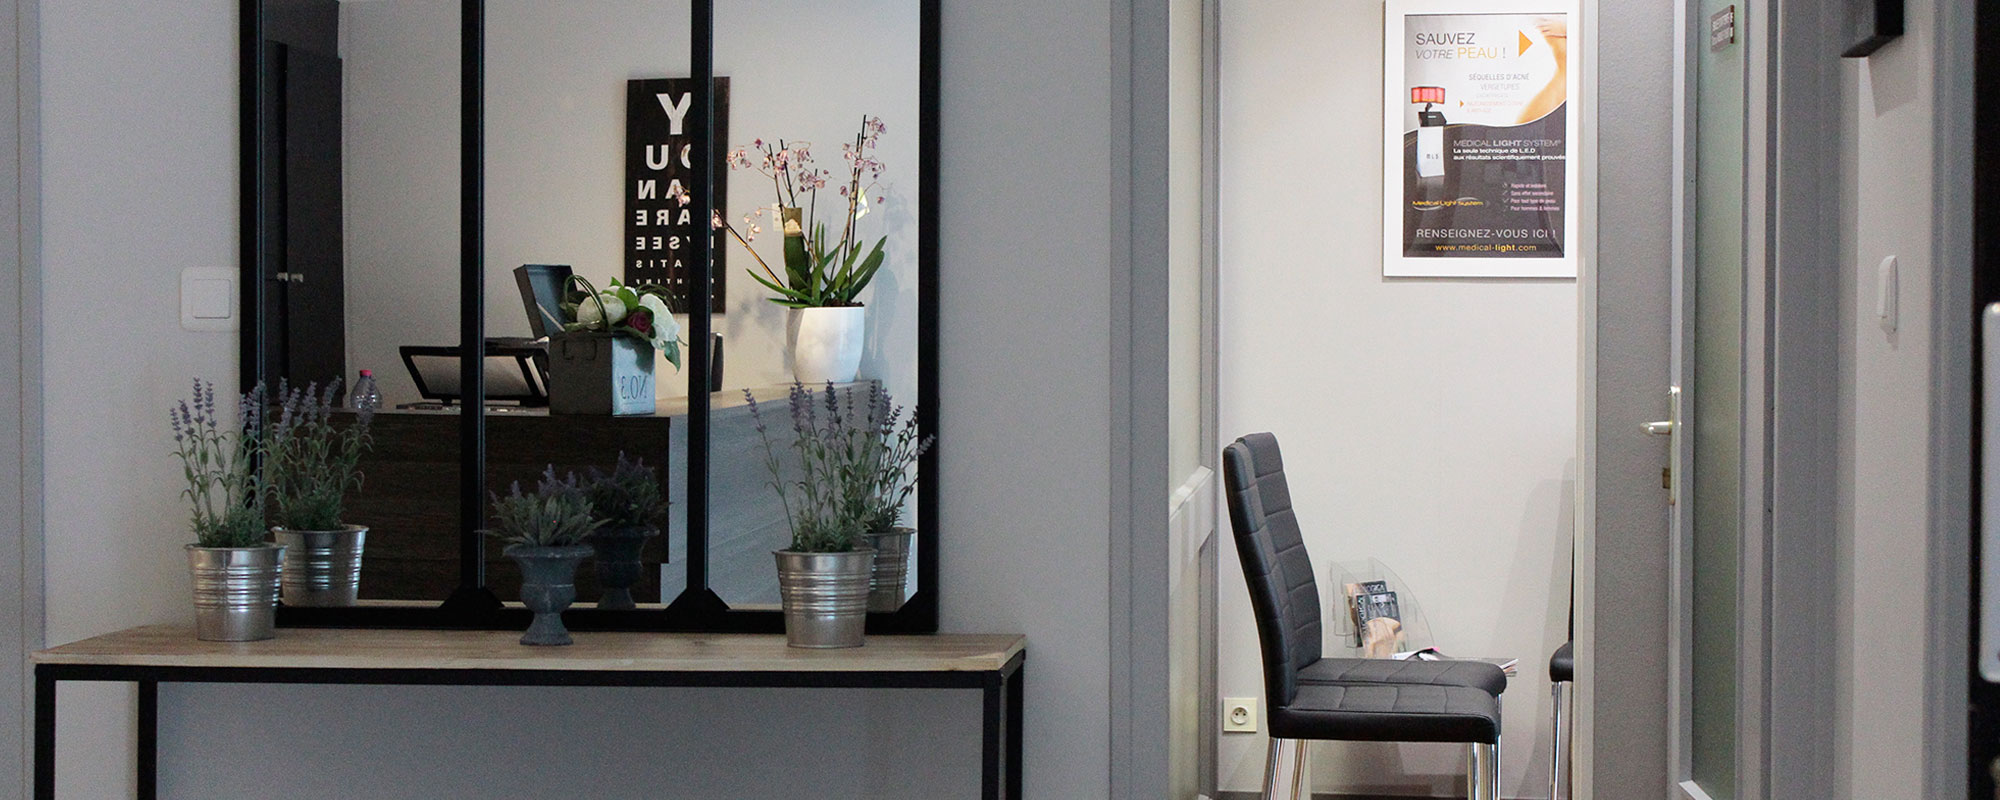 m decine esth tique dijon docteur barruet fourot. Black Bedroom Furniture Sets. Home Design Ideas